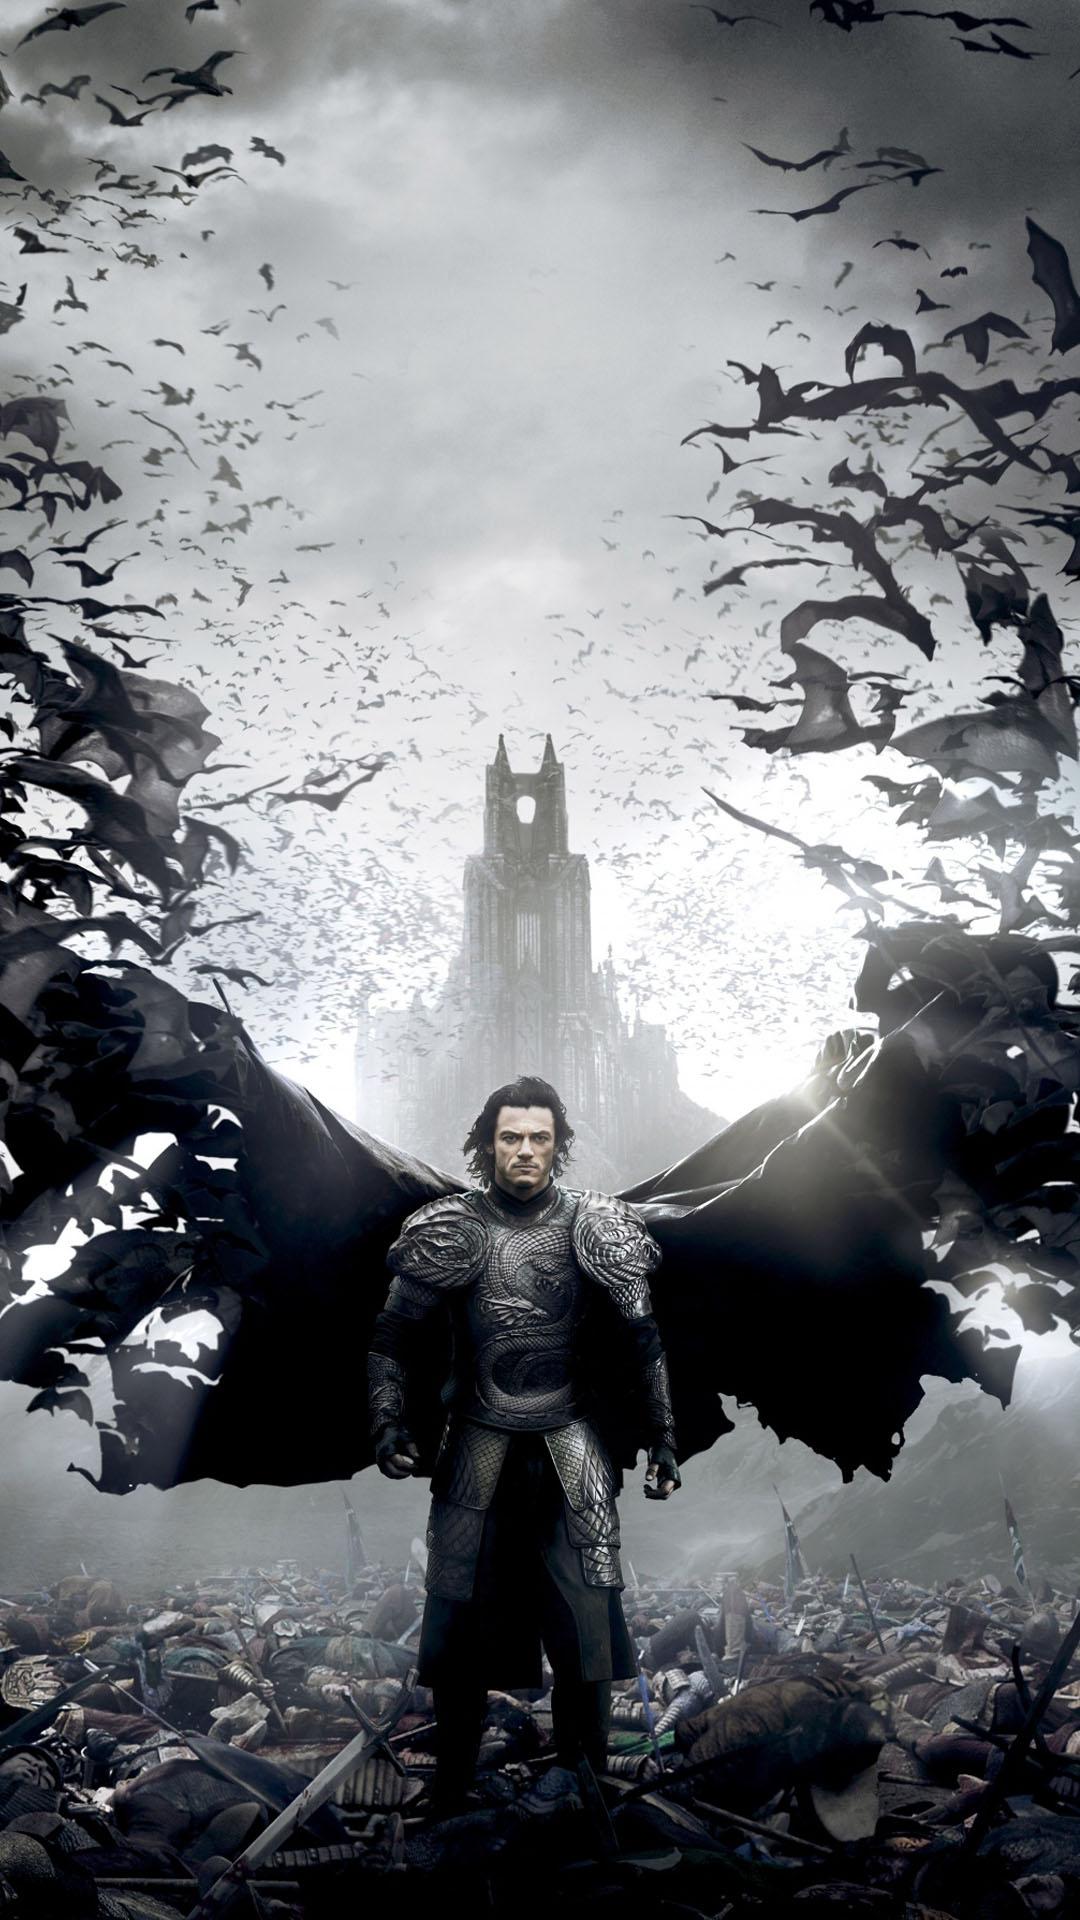 Dracula Untold Luke Evans Wallpaper   iPhone Wallpapers 1080x1920